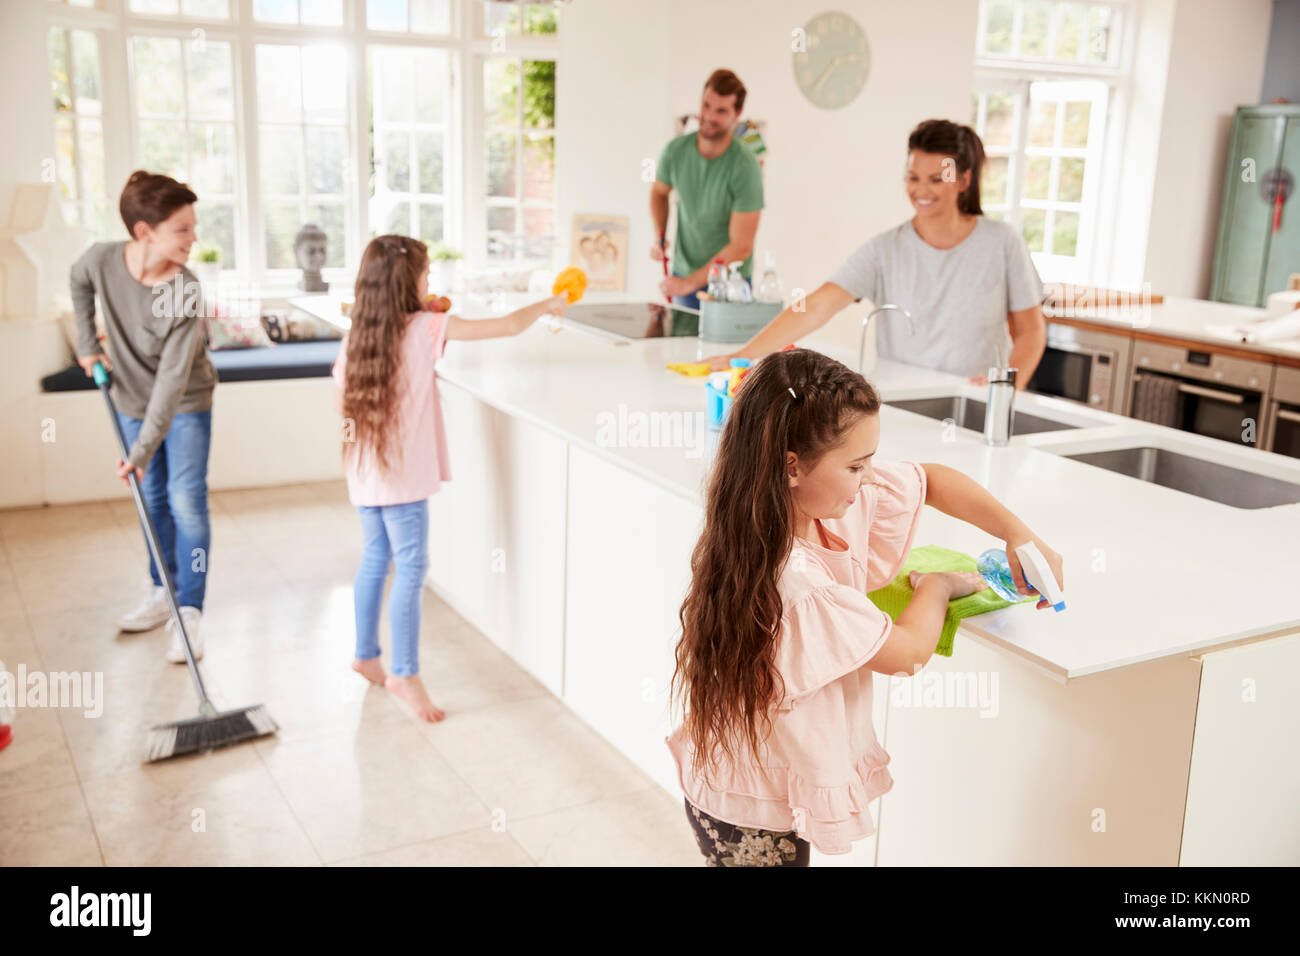 kinder eltern helfen im haushalt in der k che stockfoto bild 167033425 alamy. Black Bedroom Furniture Sets. Home Design Ideas